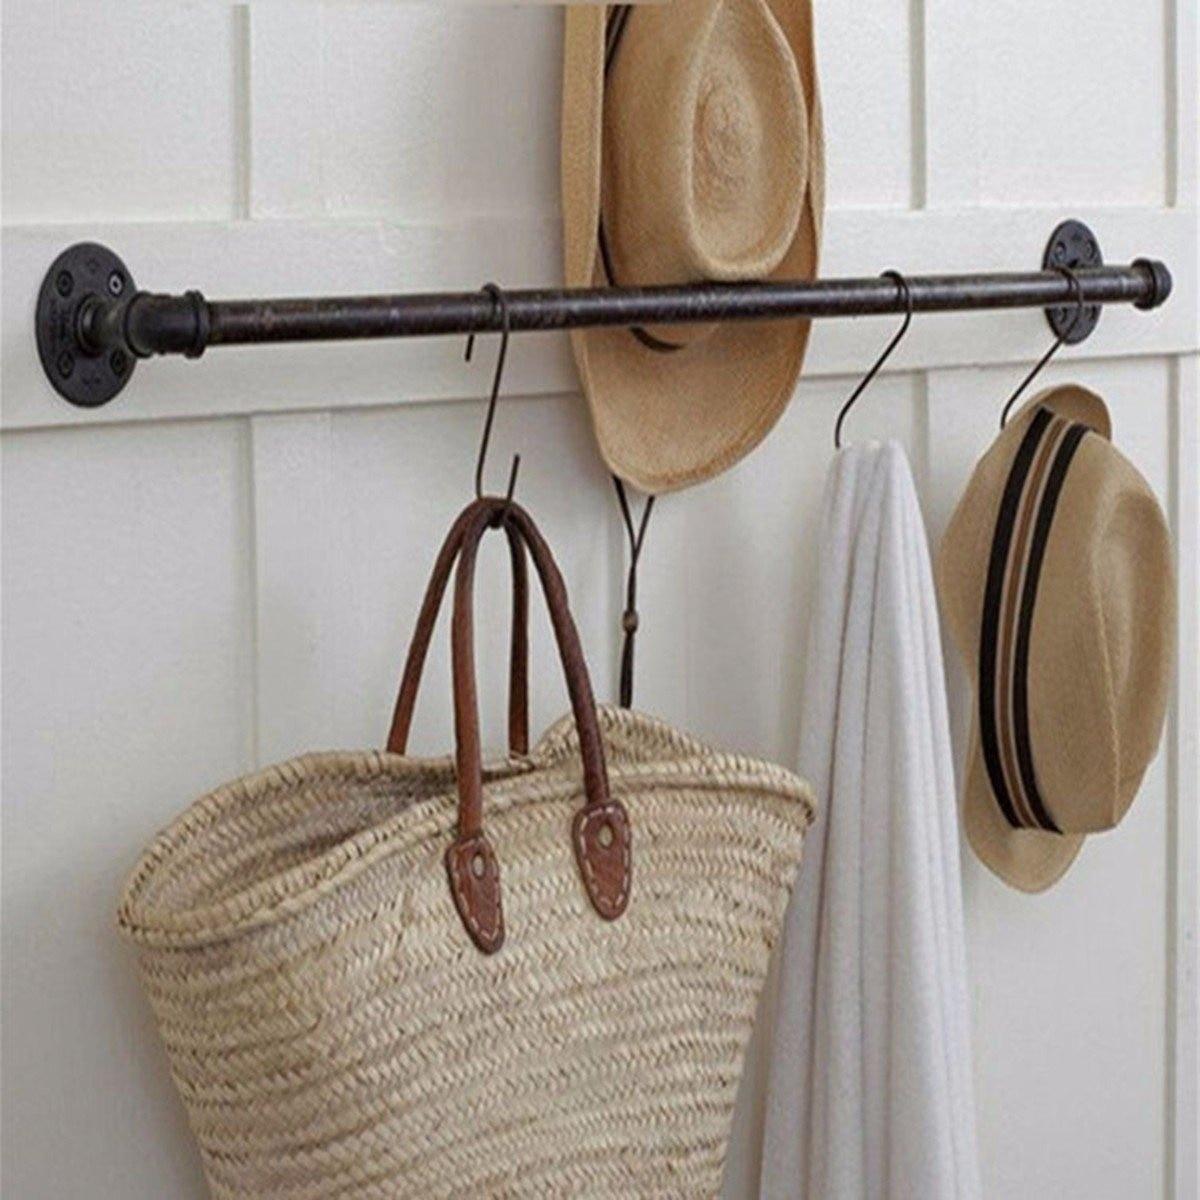 4 Sizes Retro Towel Rail Rack Shower Bathroom Industrial Iron Pipe Black Iron Towel Rail Holder Hanging Shelves With 8pcs Screws